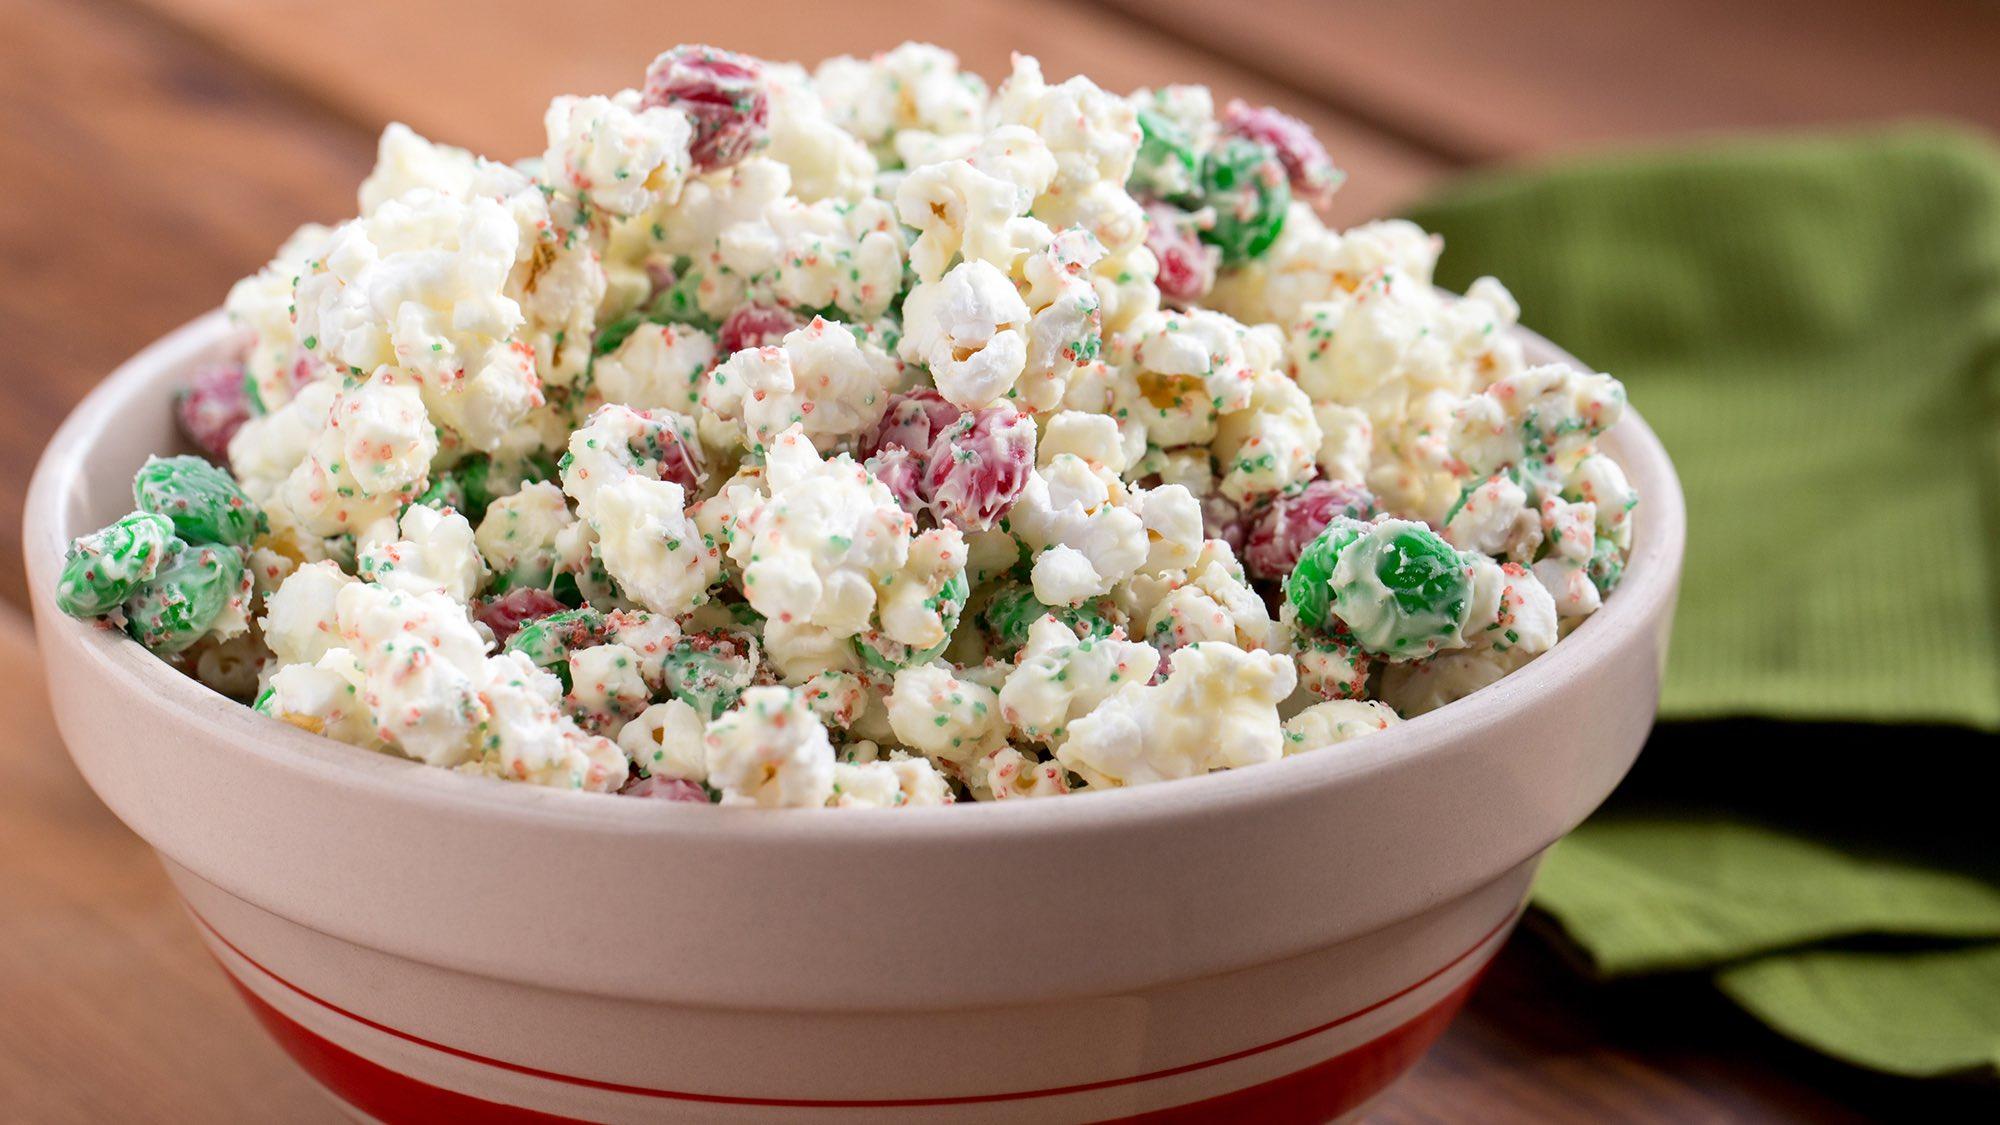 McCormick Peppermint Crunch Popcorn